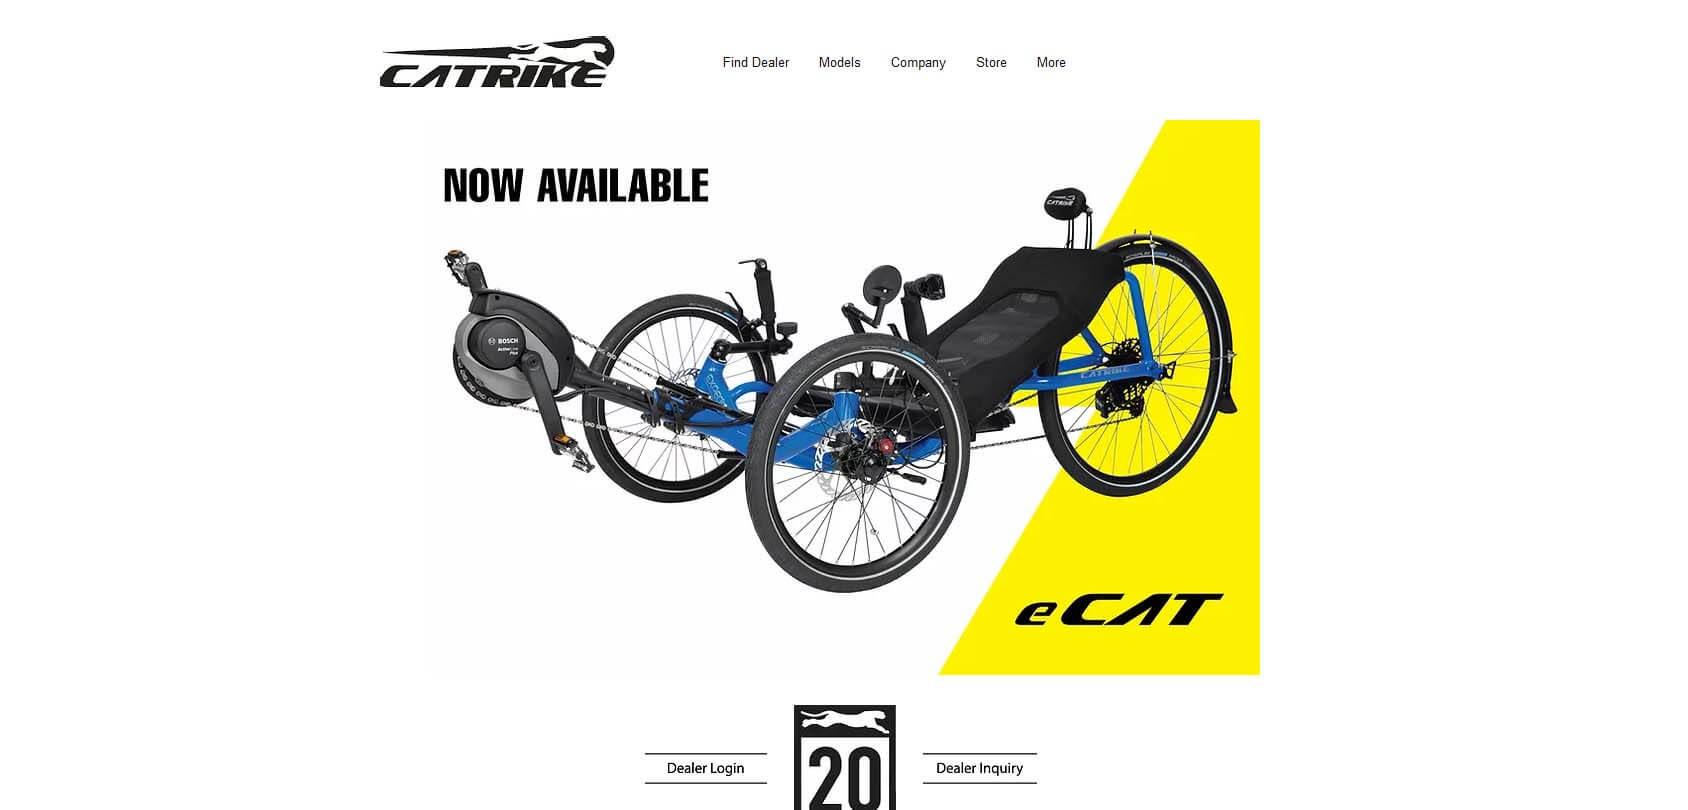 Catrike Homepage